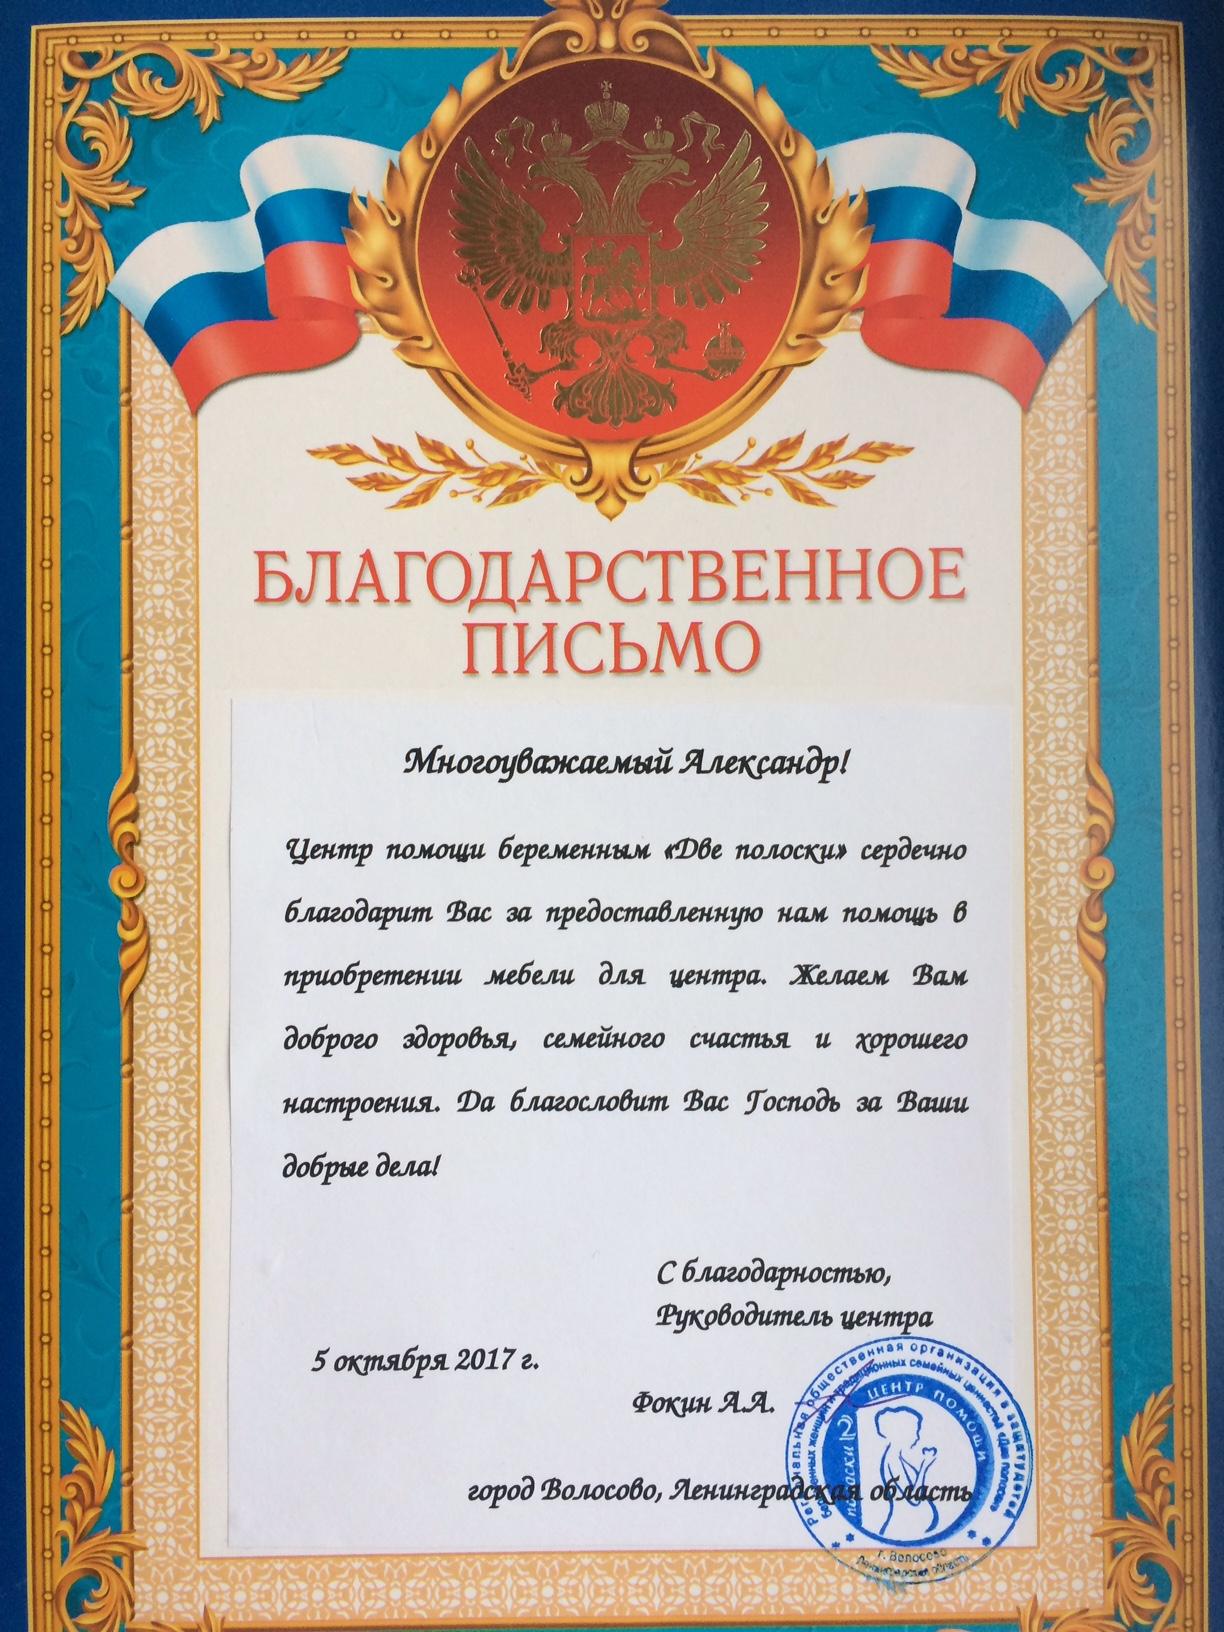 Благодарим за средства на покупку шкафов в ЦЗМ г. Волосово